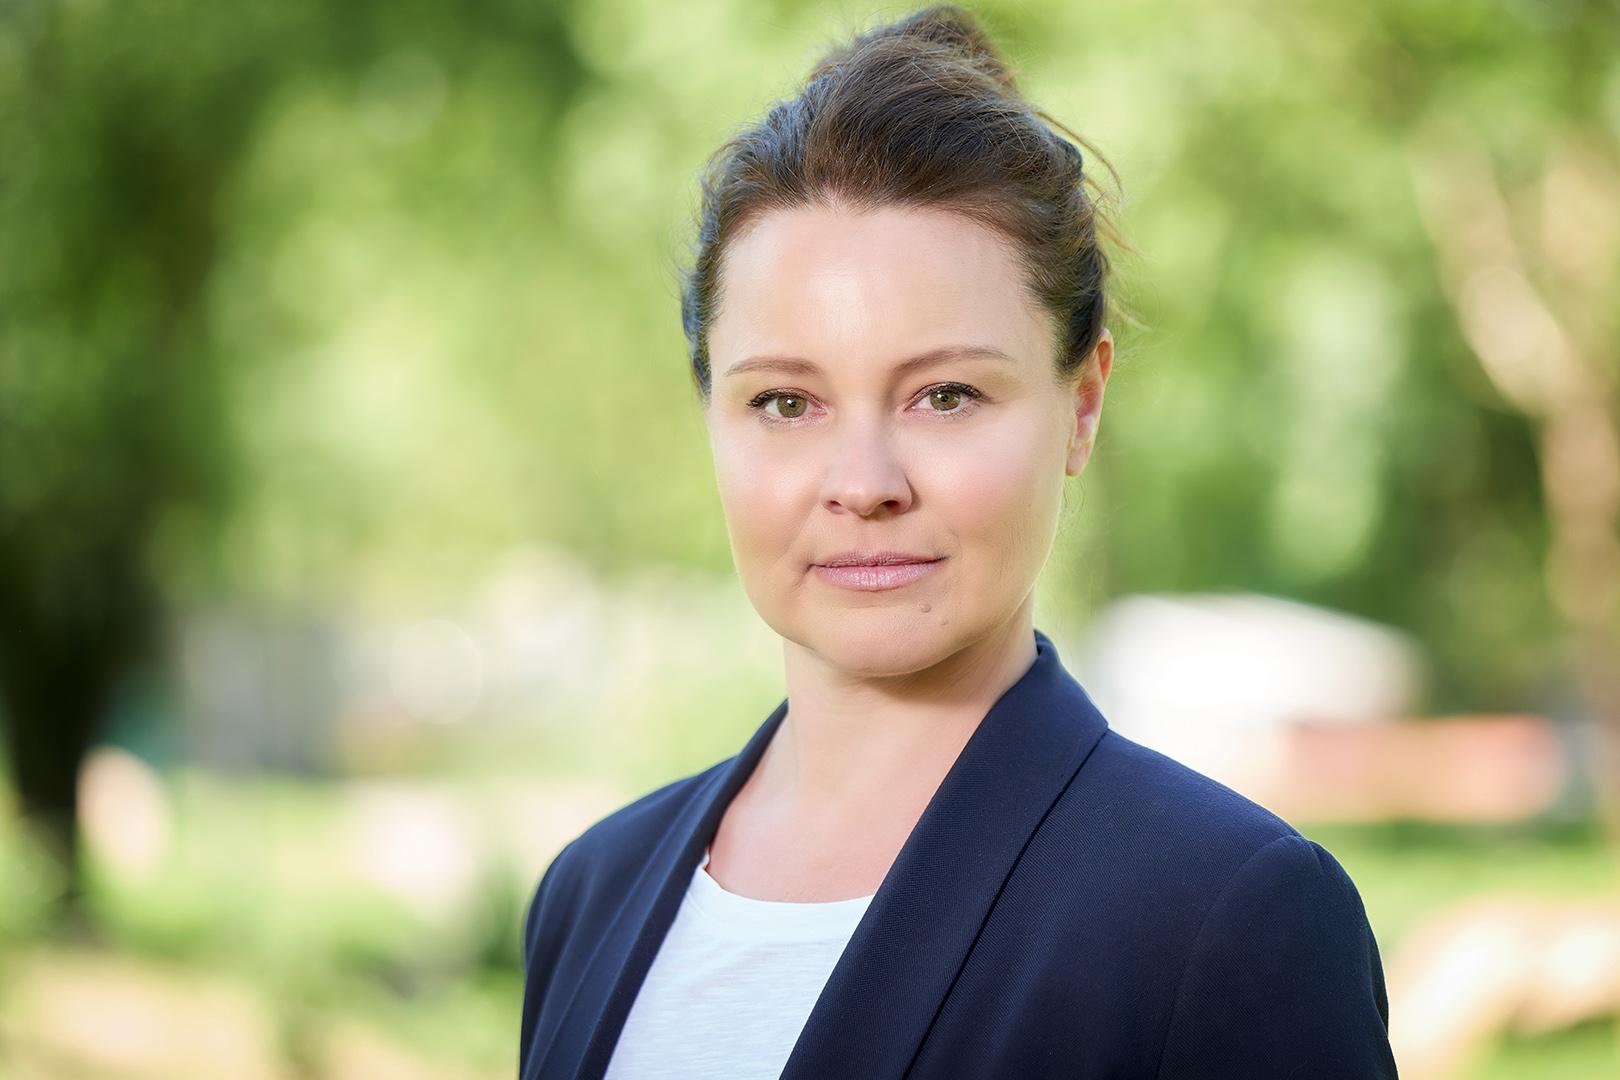 Dr. Julia Stubenbord, Landestierschutzbeauftragte in Baden-Württemberg